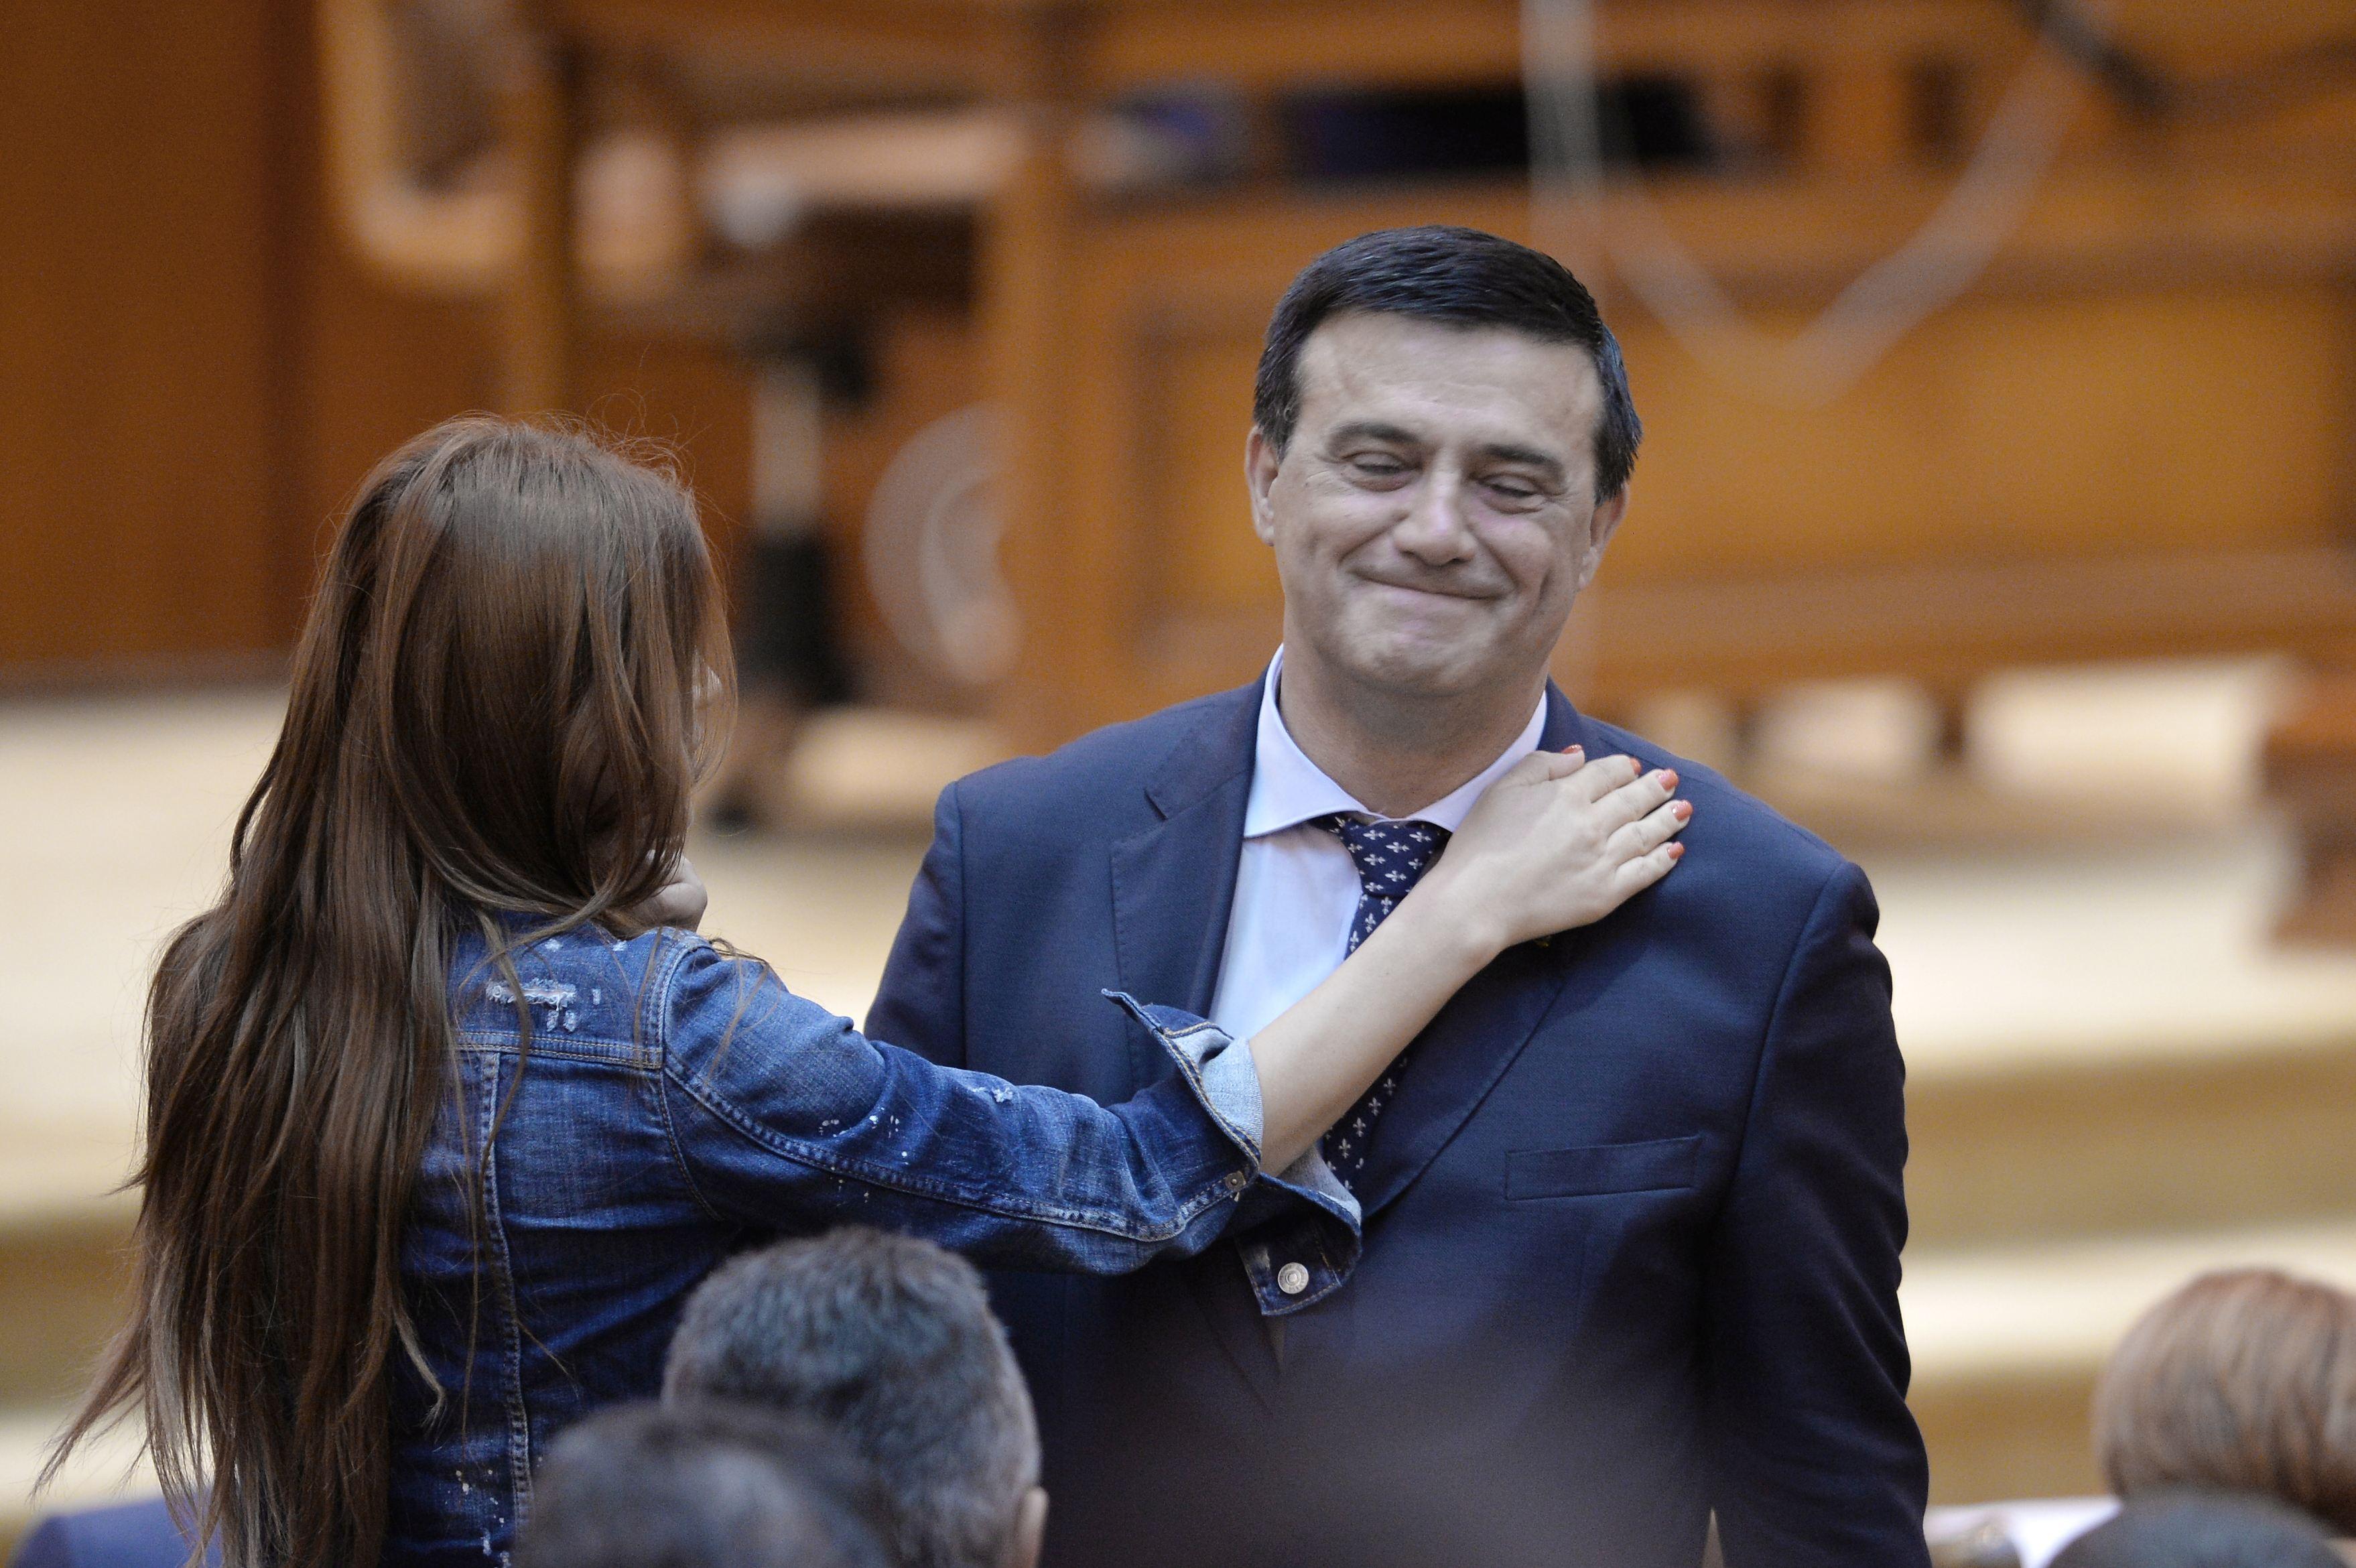 Nicolae Badalau Presedintele Executiv Psd Acuzat Pocnit Fostul Deputat Pnl Marin Anton Venise Neinvitat